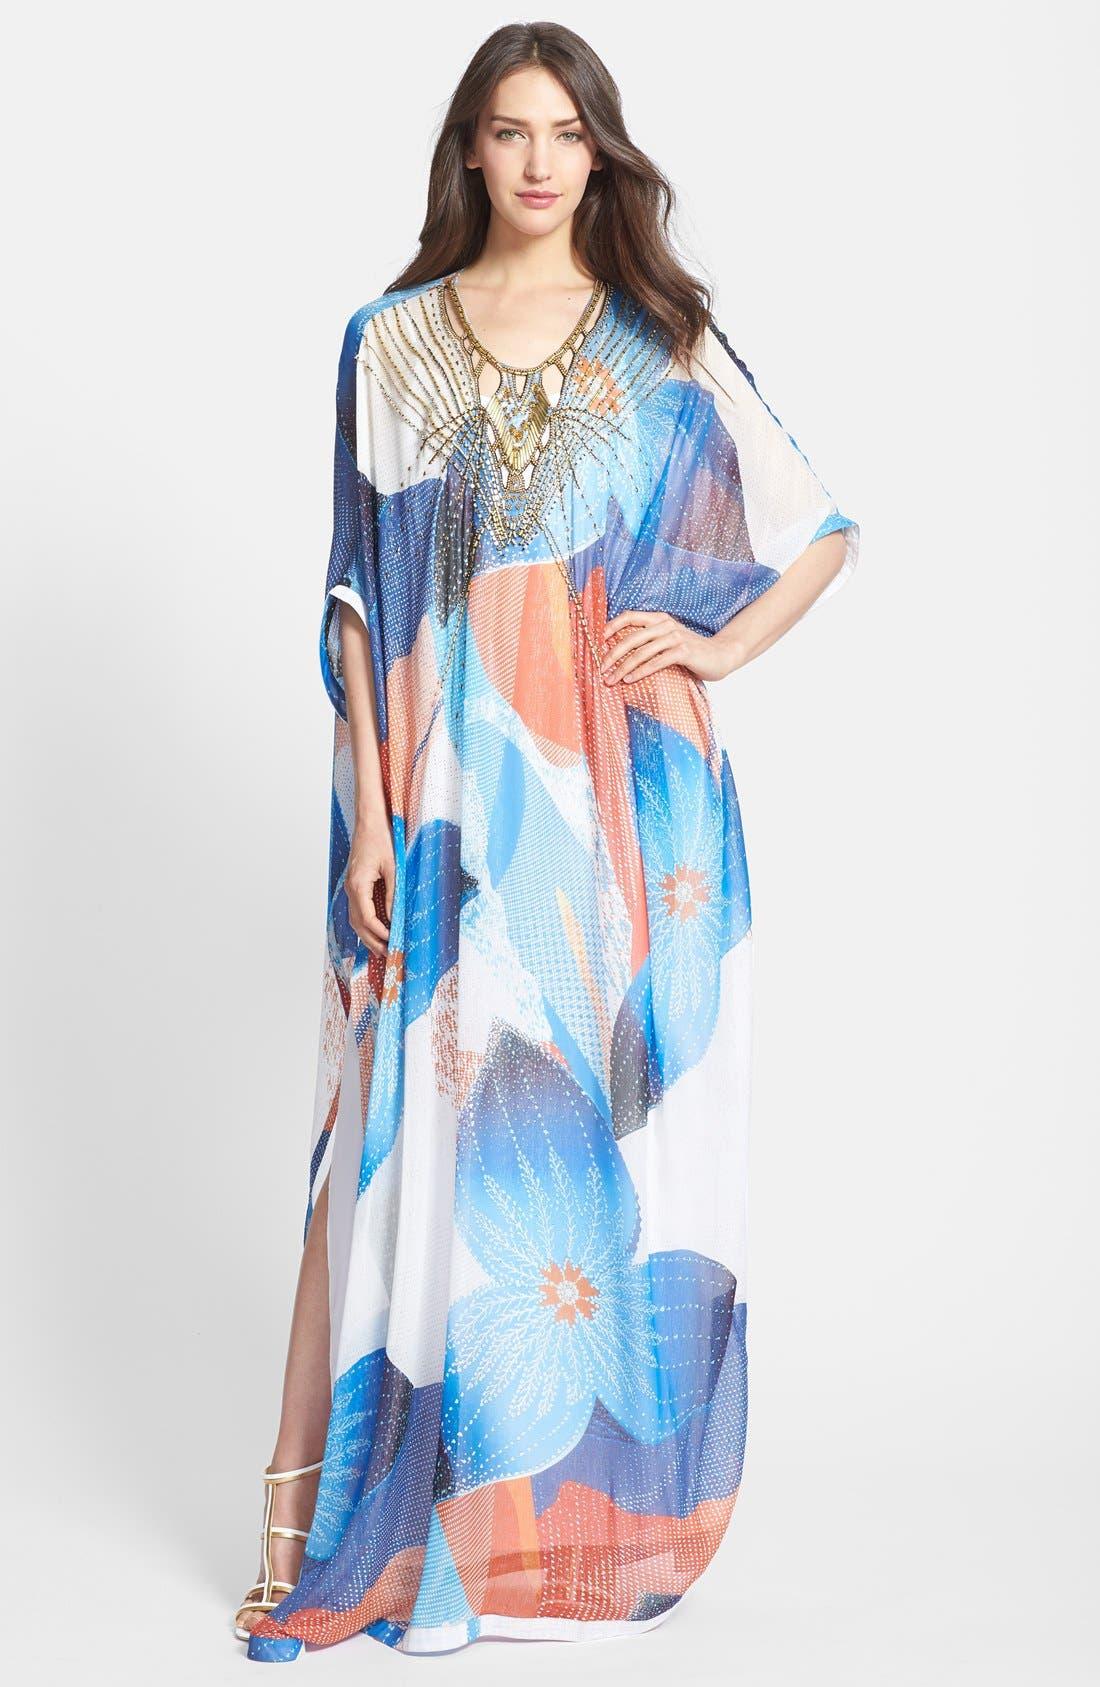 Main Image - Diane von Furstenberg 'Clare' Beaded Print Silk Blend Caftan